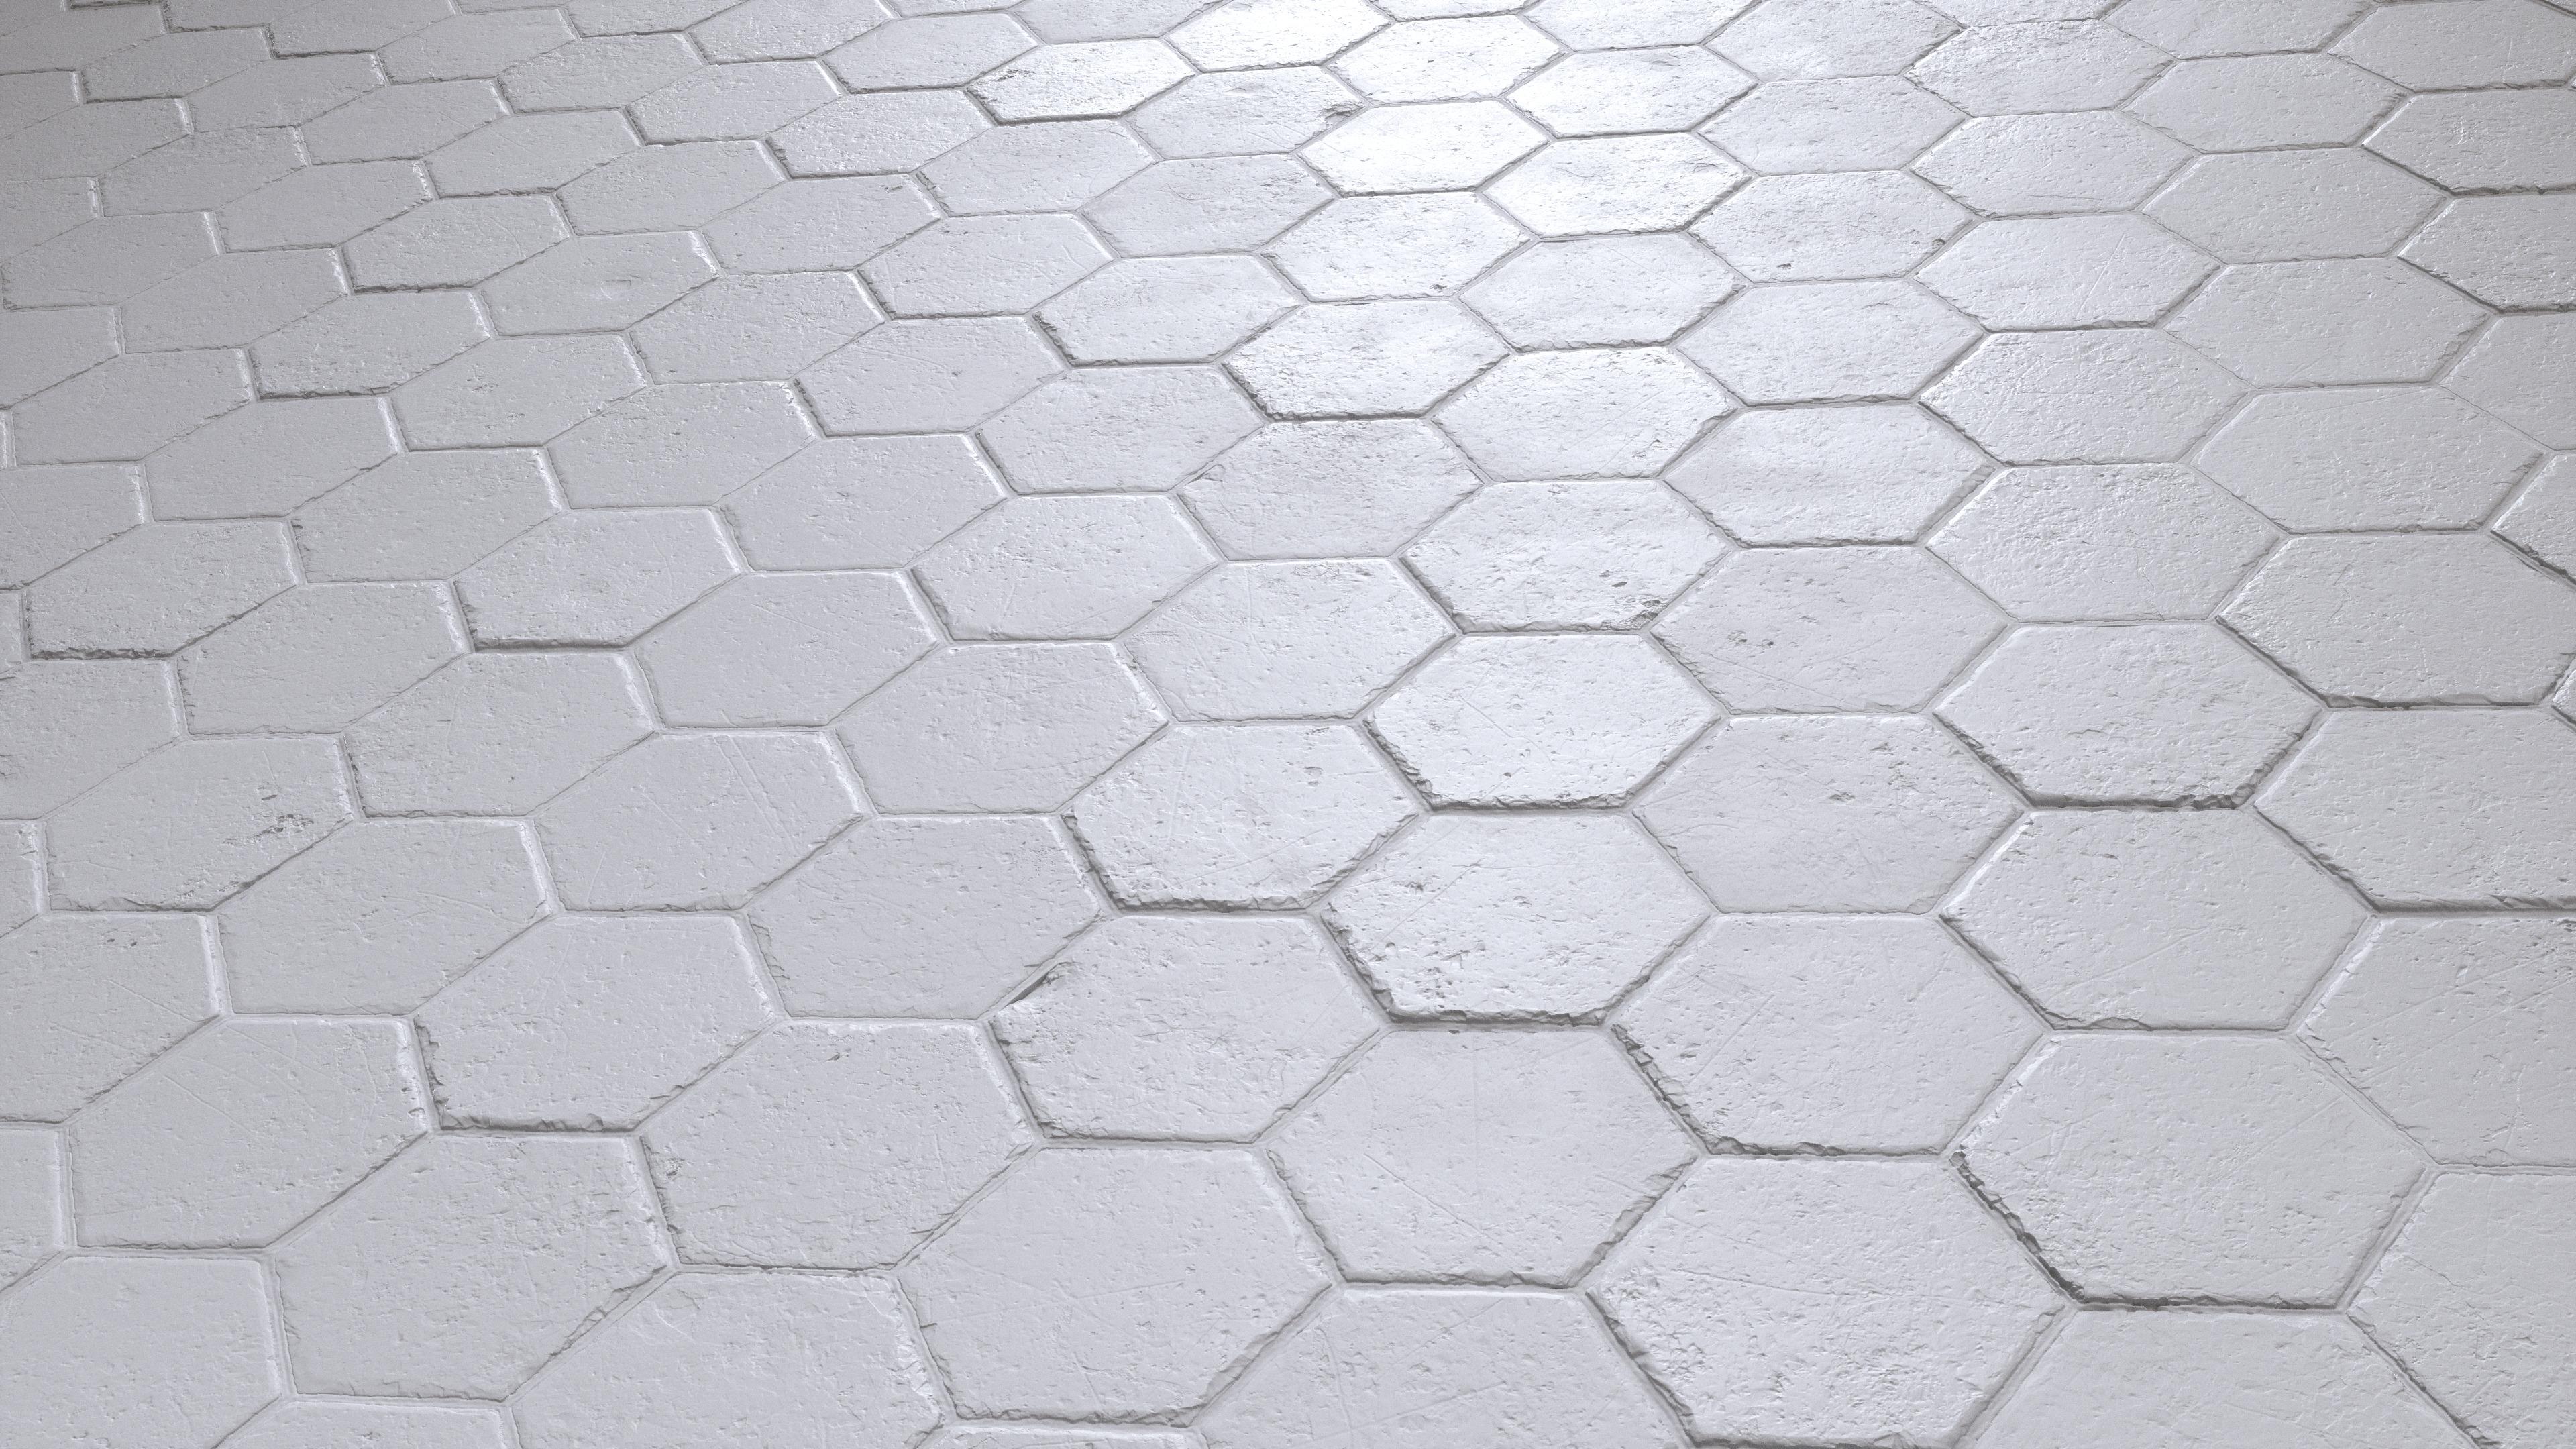 Hexagonal Terracotta Floor Tiles Pbr00191